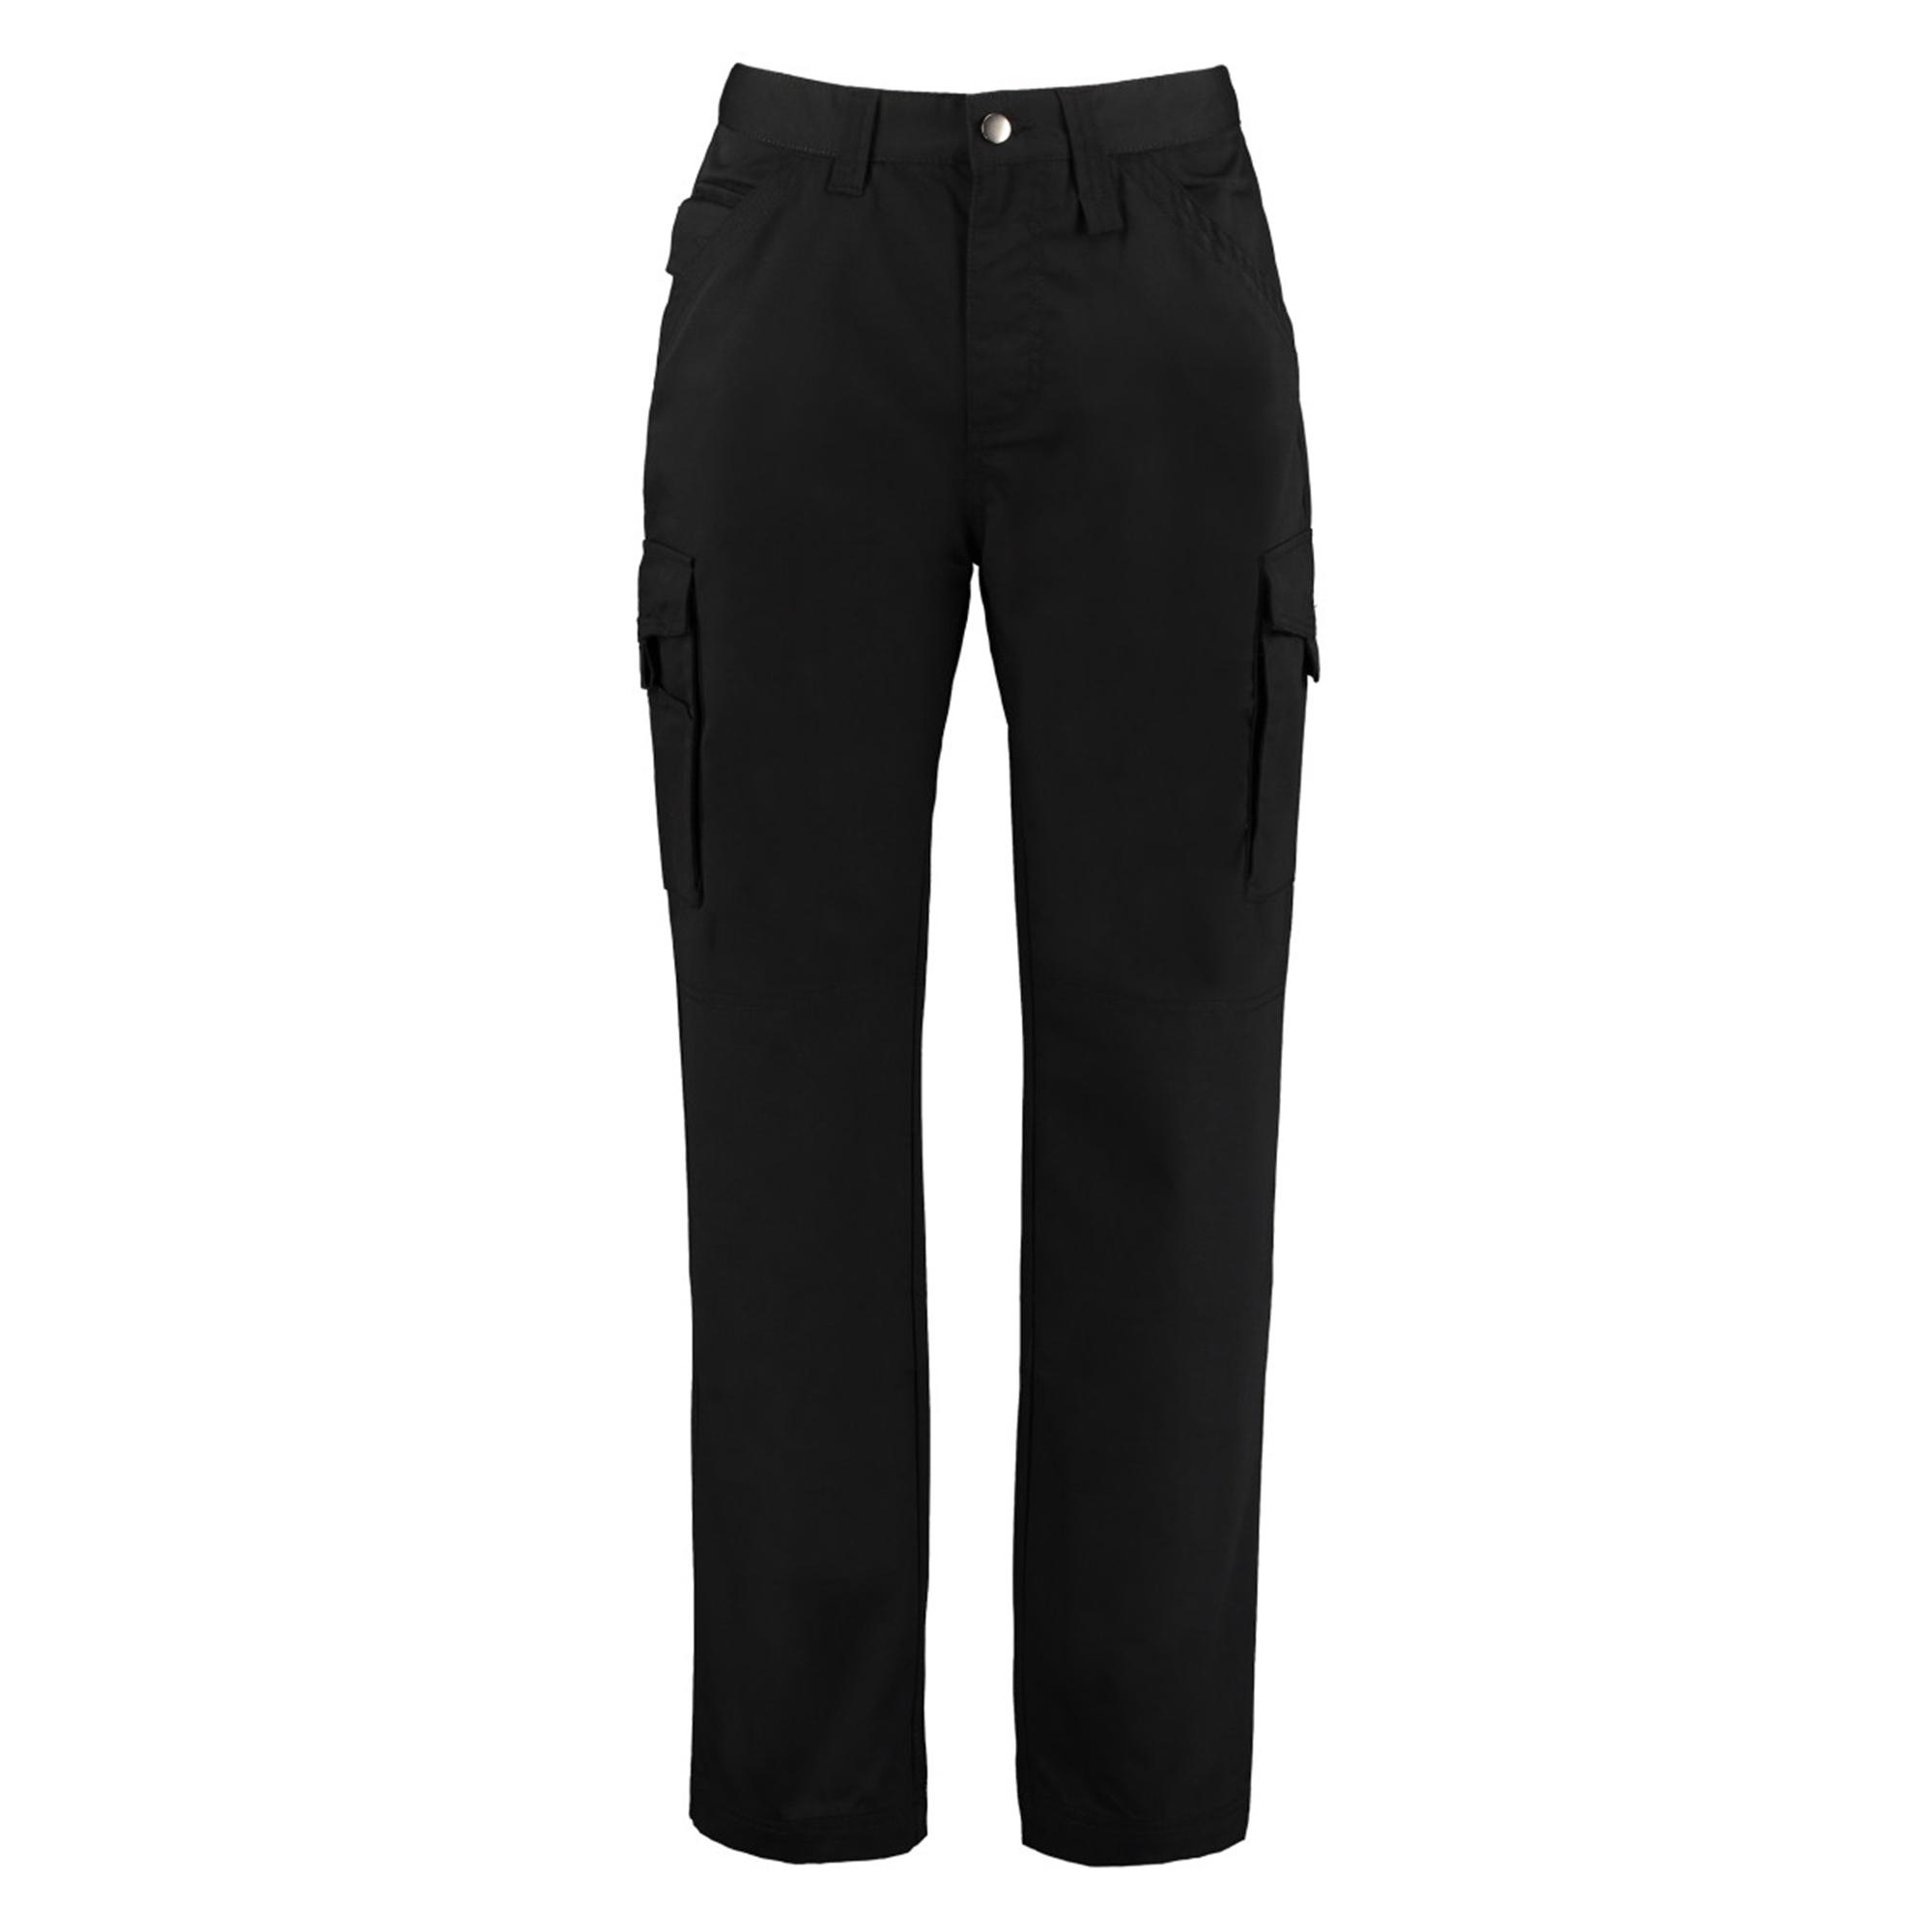 Kustom Kit Mens Workwear Trousers (30S) (Black)